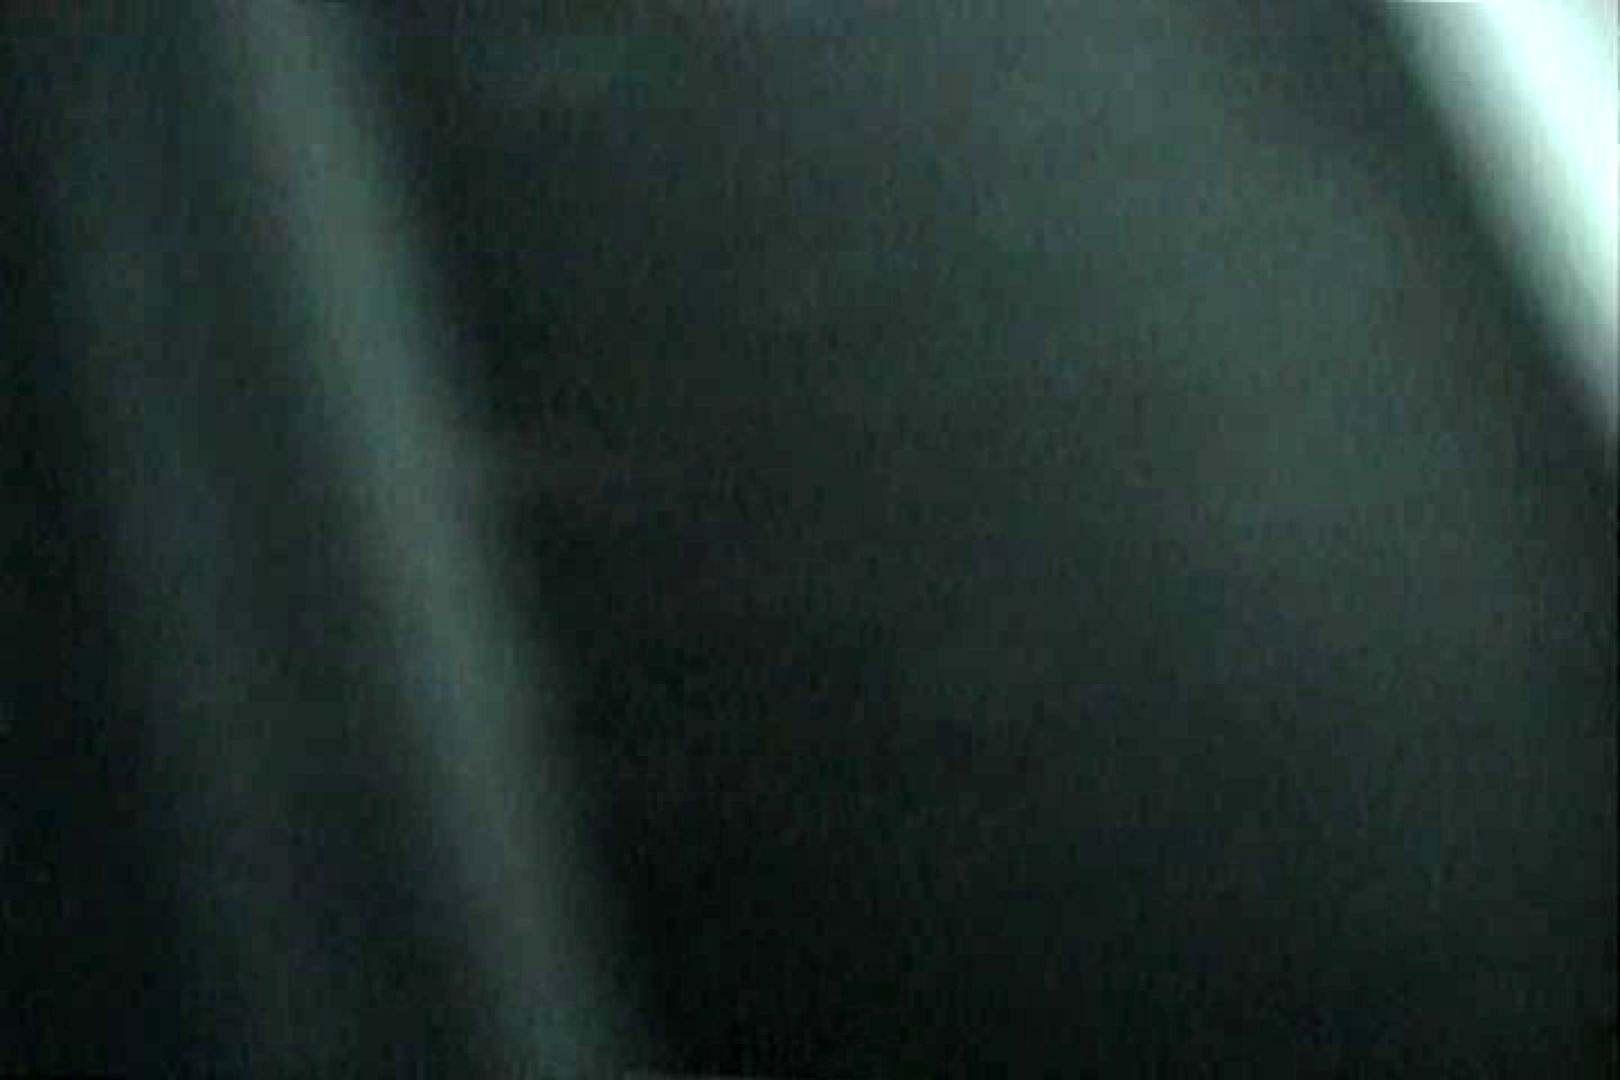 充血監督の深夜の運動会Vol.126 赤外線 エロ無料画像 107画像 68